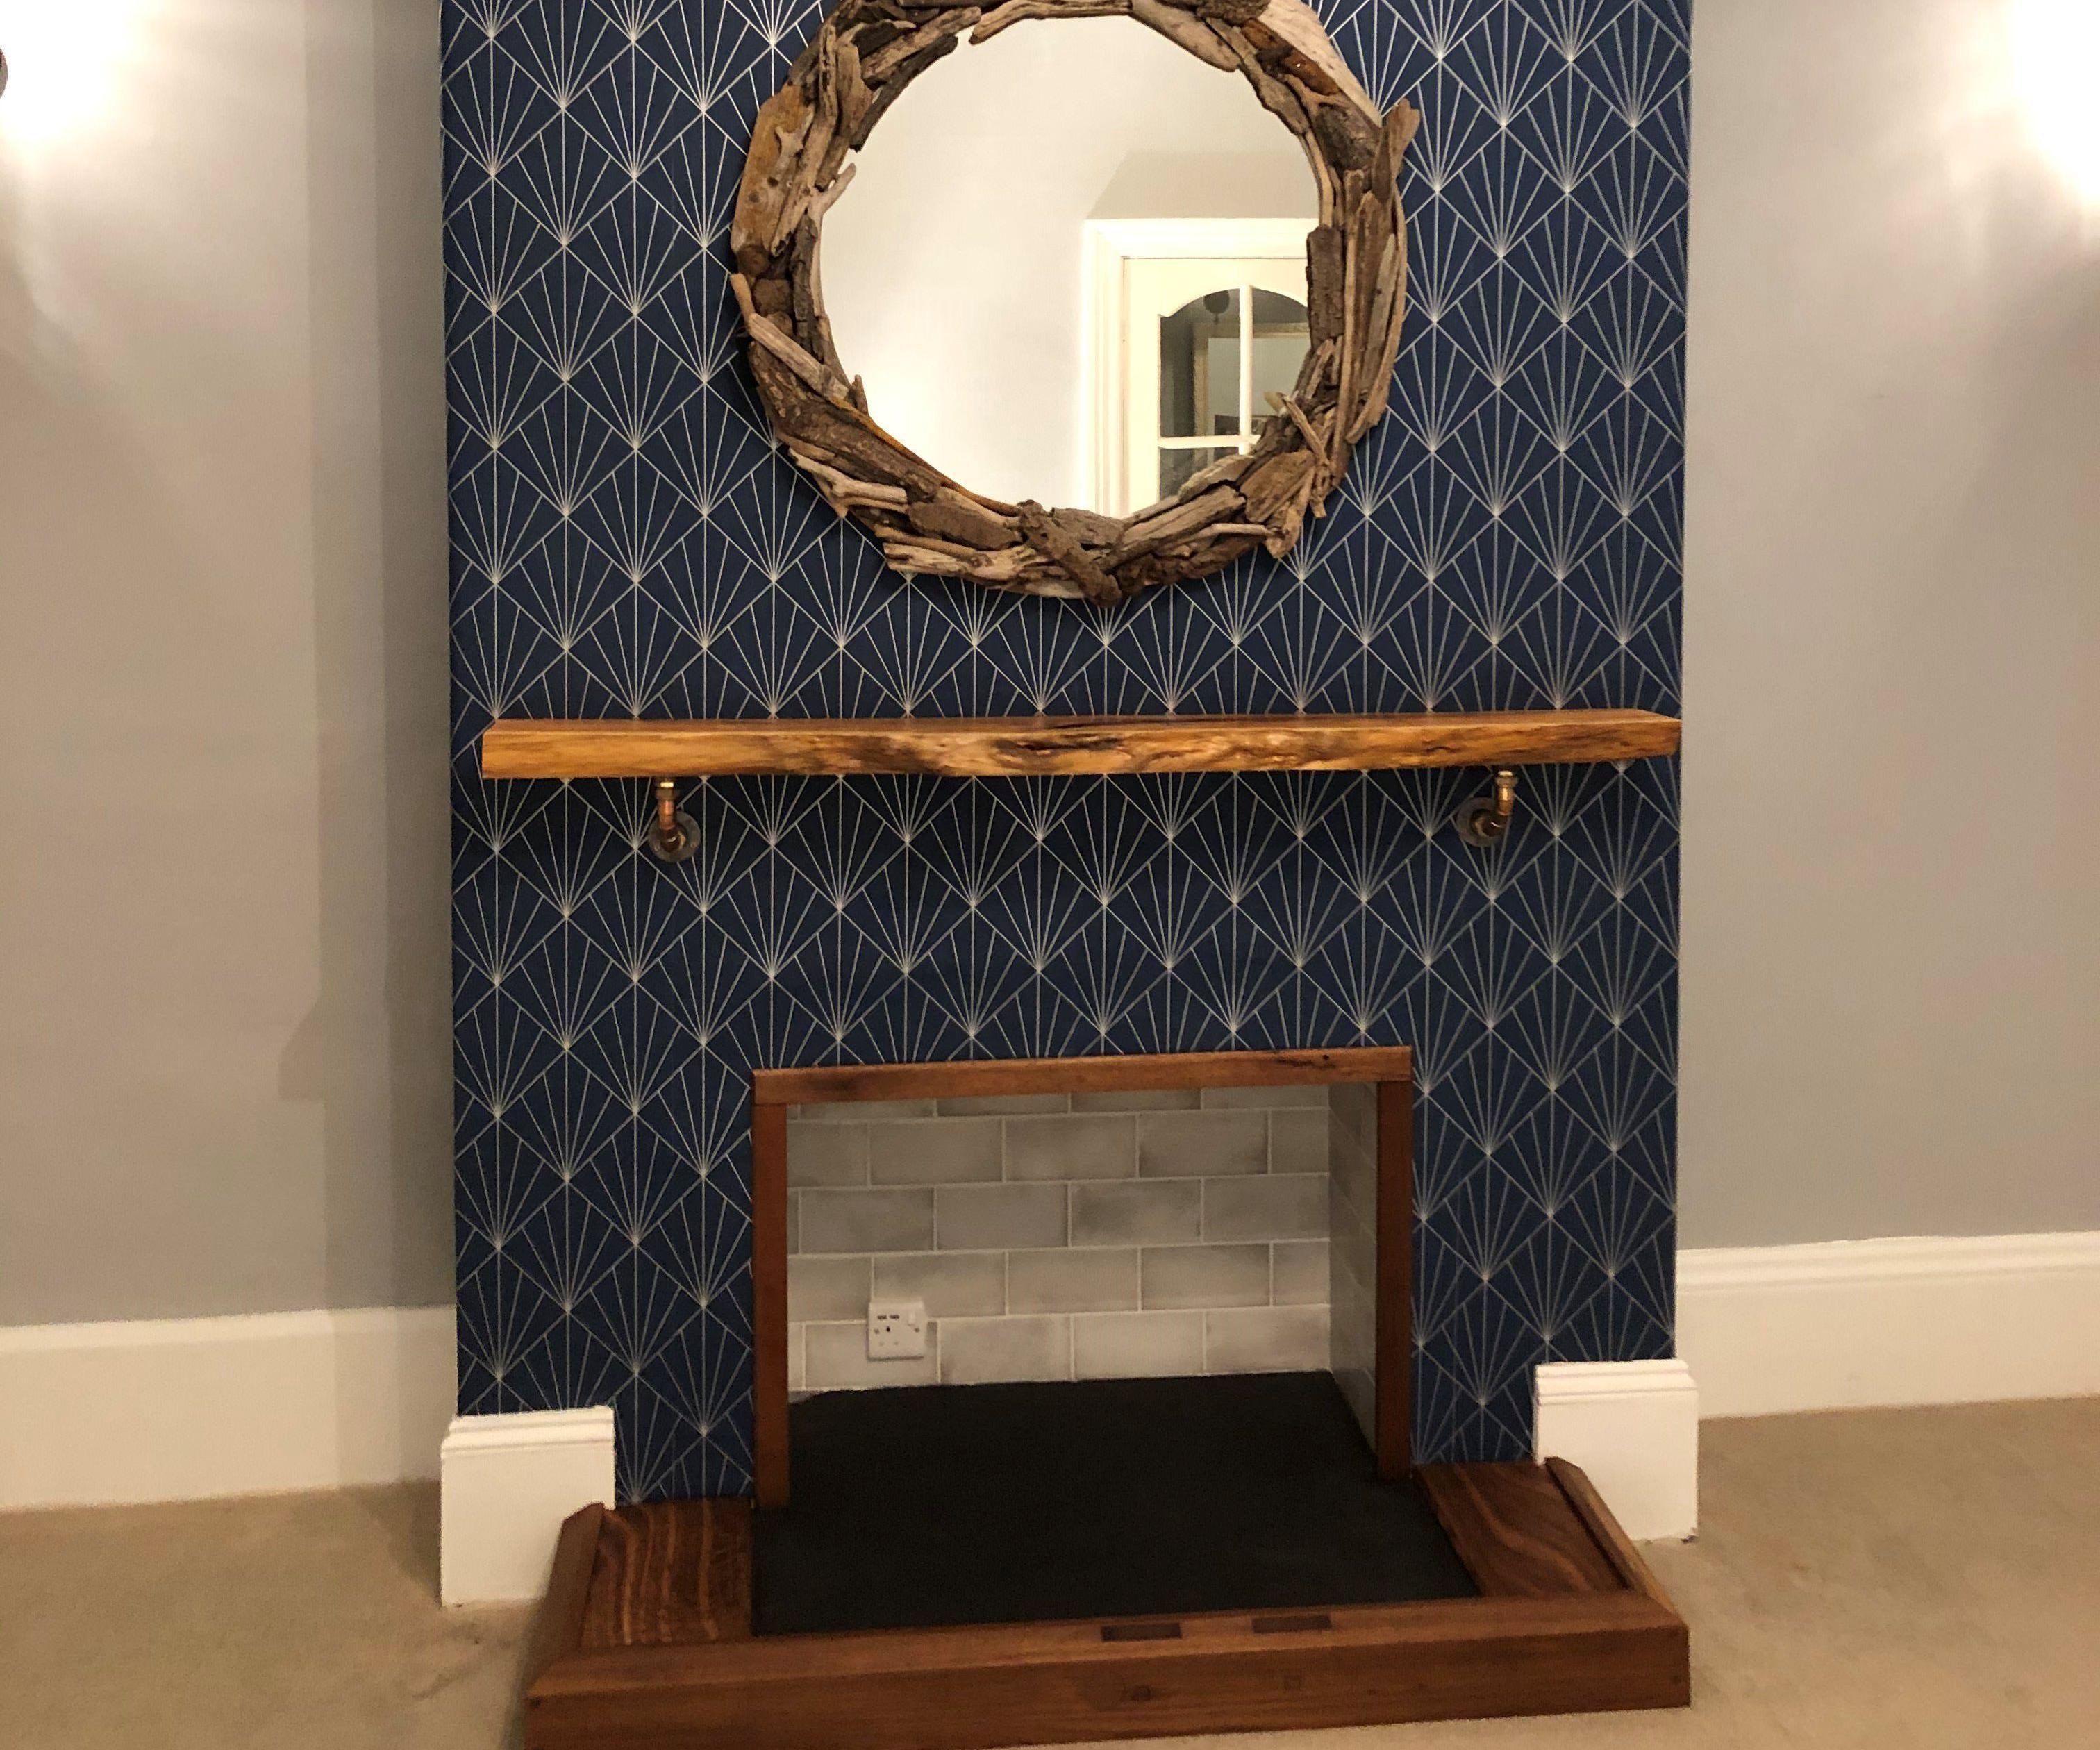 Fireplace Remove & Rebuild